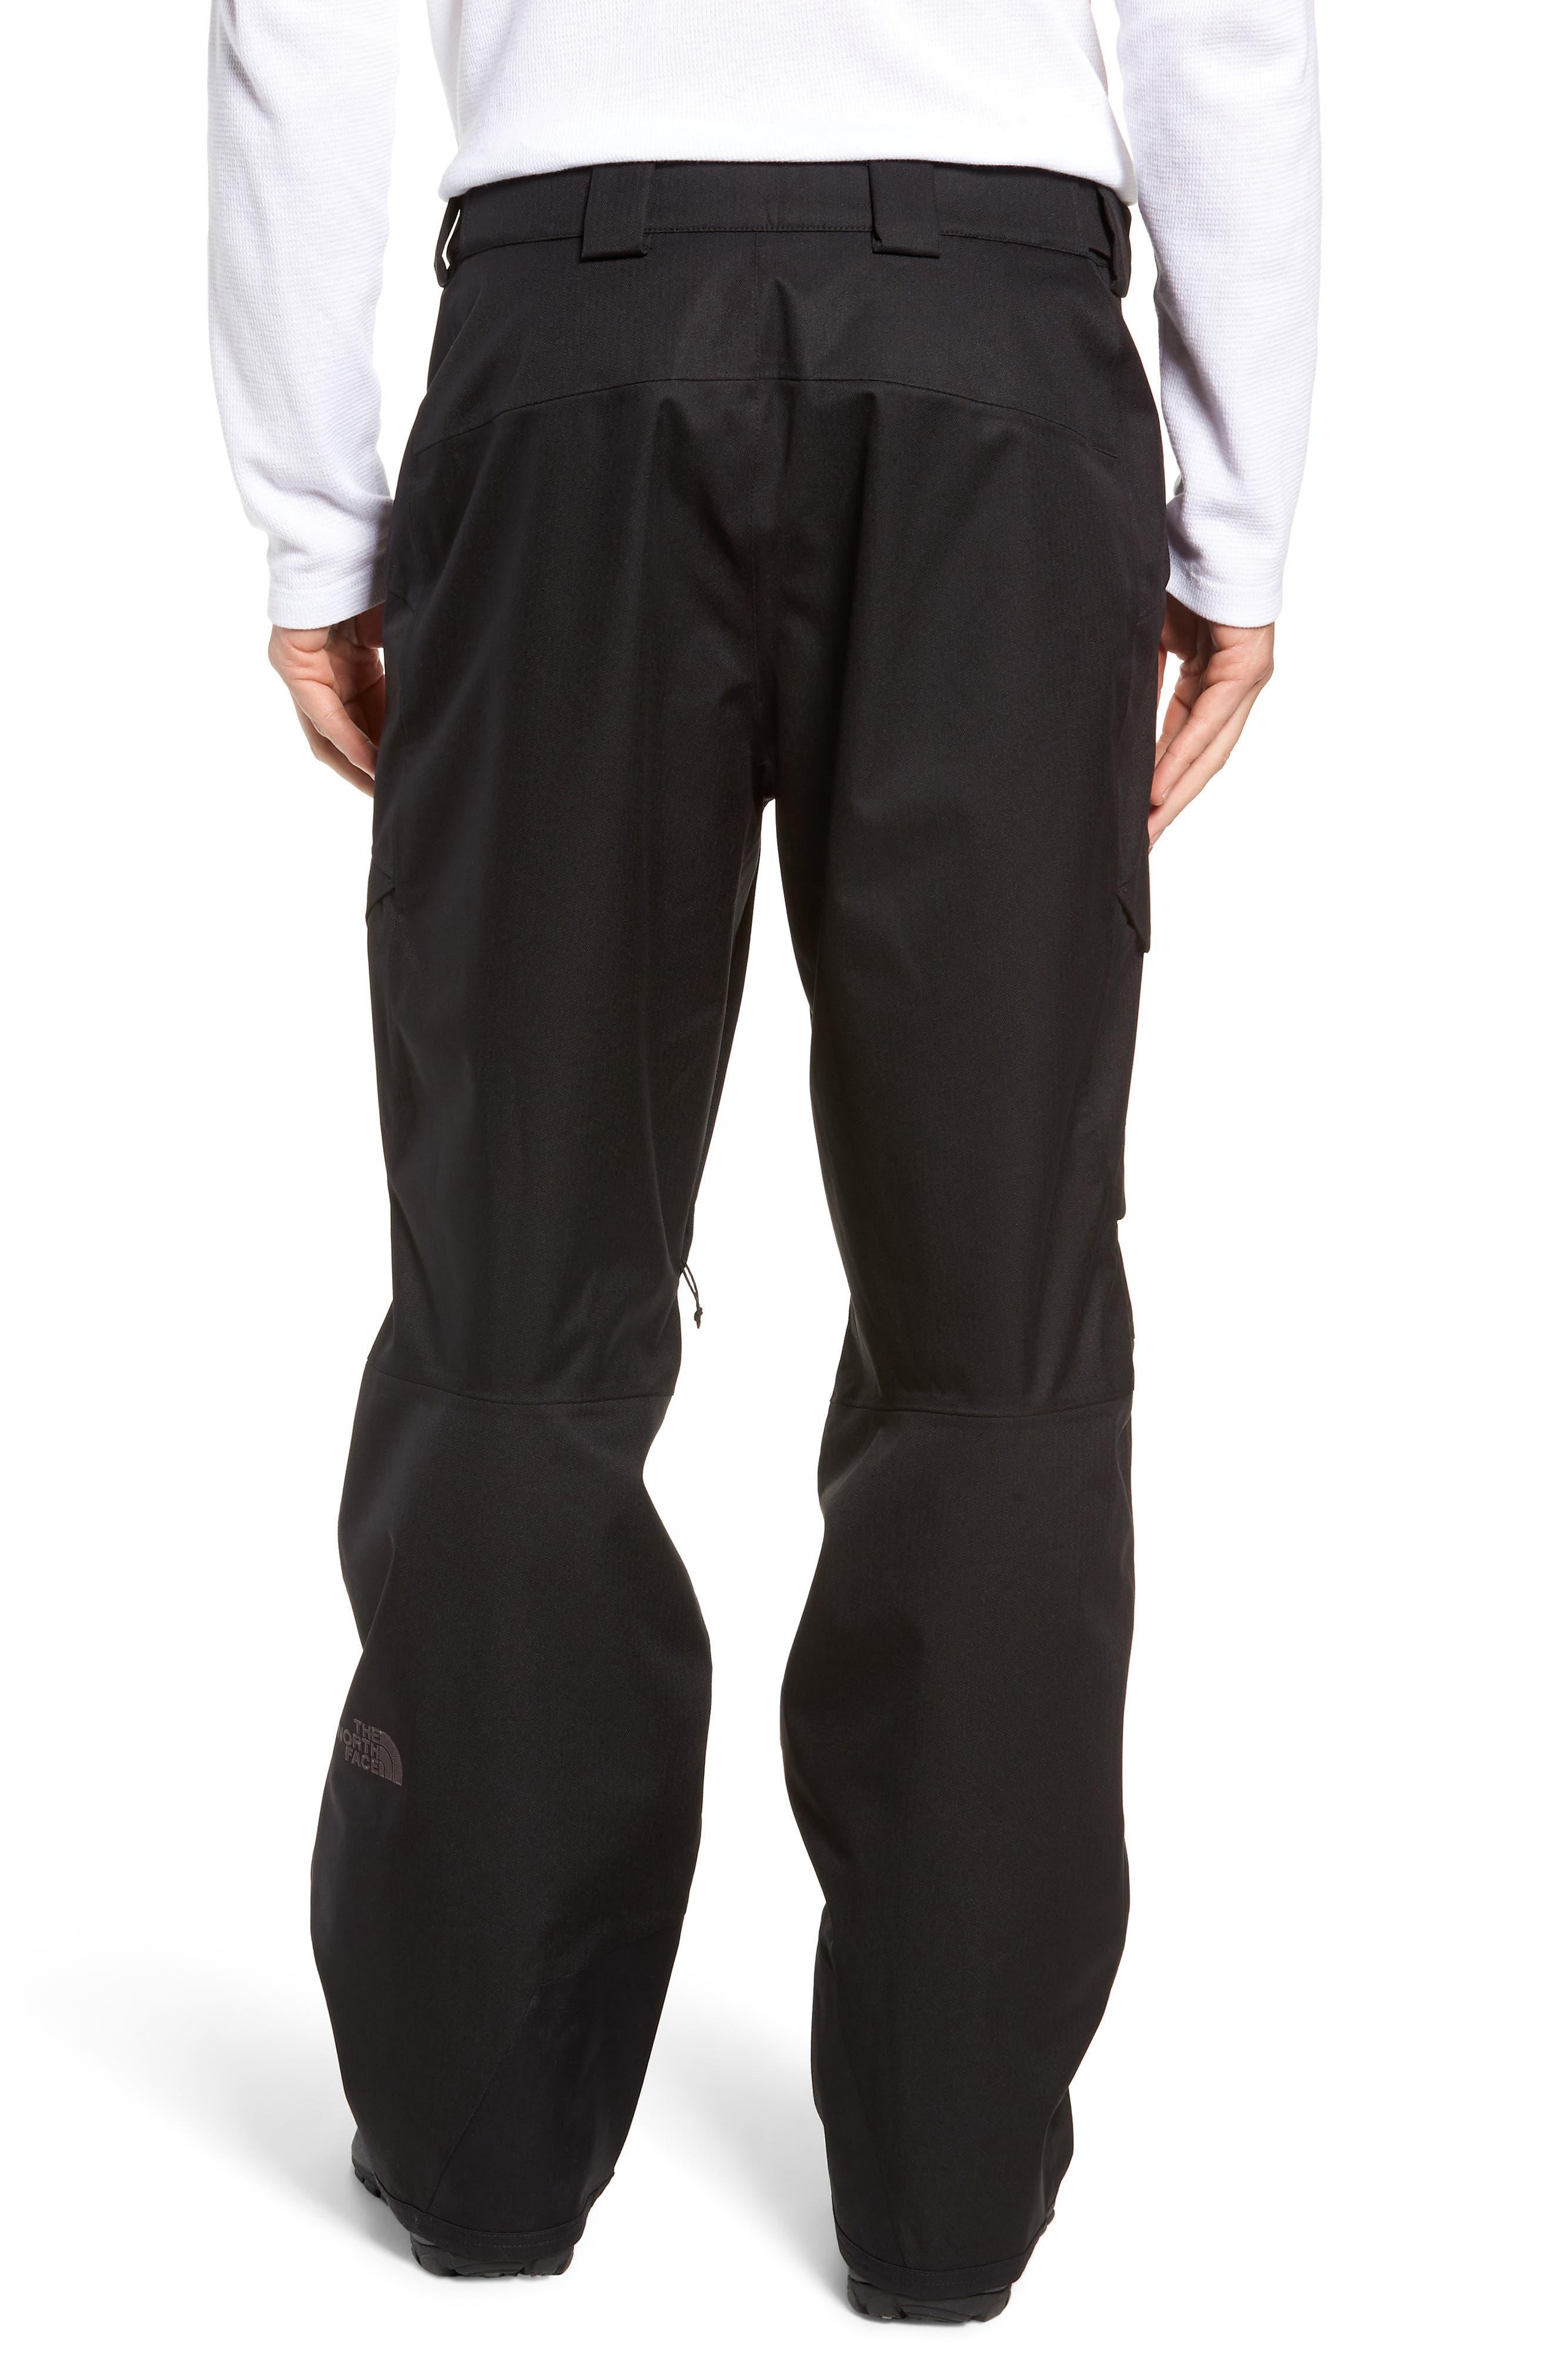 Gatekeeper Waterproof Pants,                             Alternate thumbnail 2, color,                             TNF BLACK/TNF BLACK